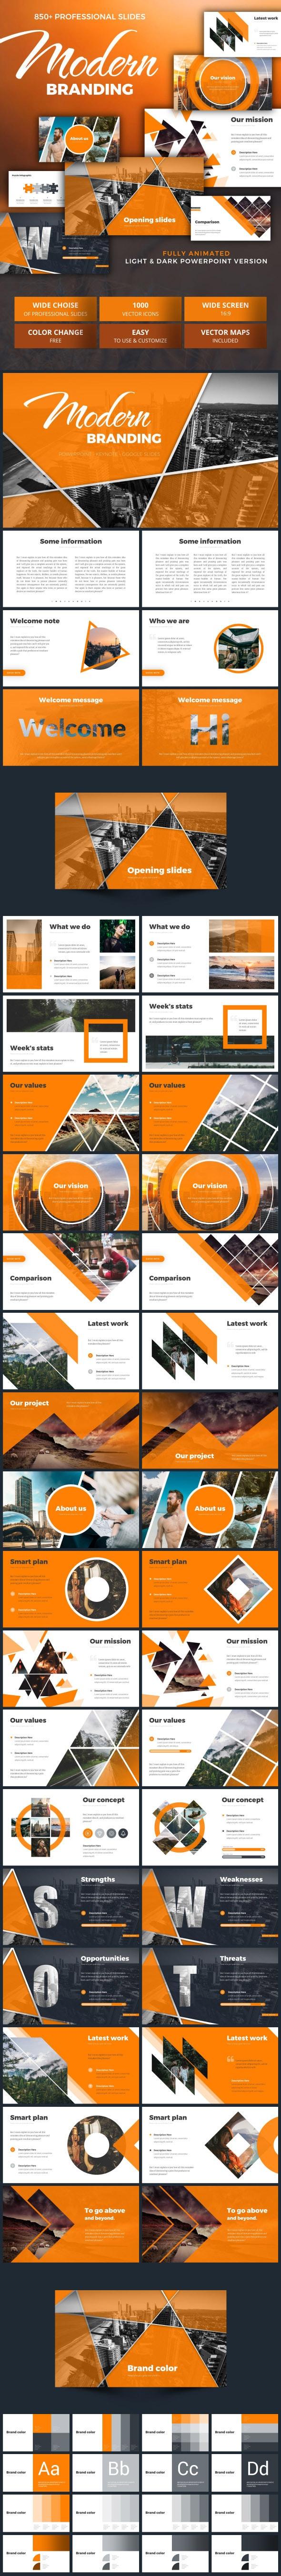 Modern Business Pitch Deck - Pitch Deck PowerPoint Templates